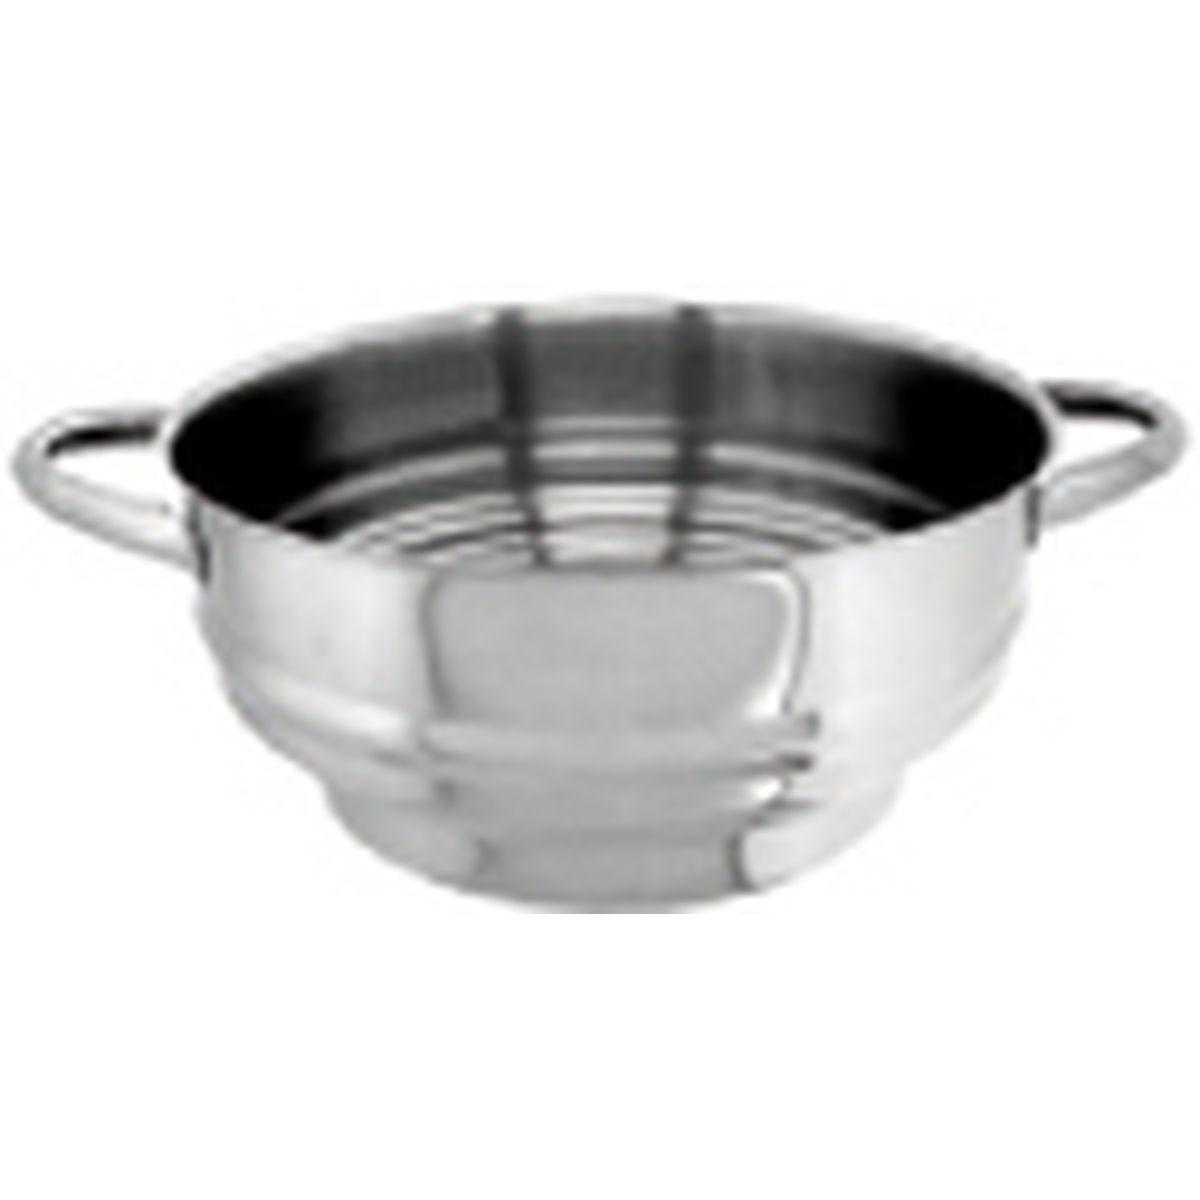 Cuit vapeur inox multi diamètres16 - 24 cm - Alice Delice